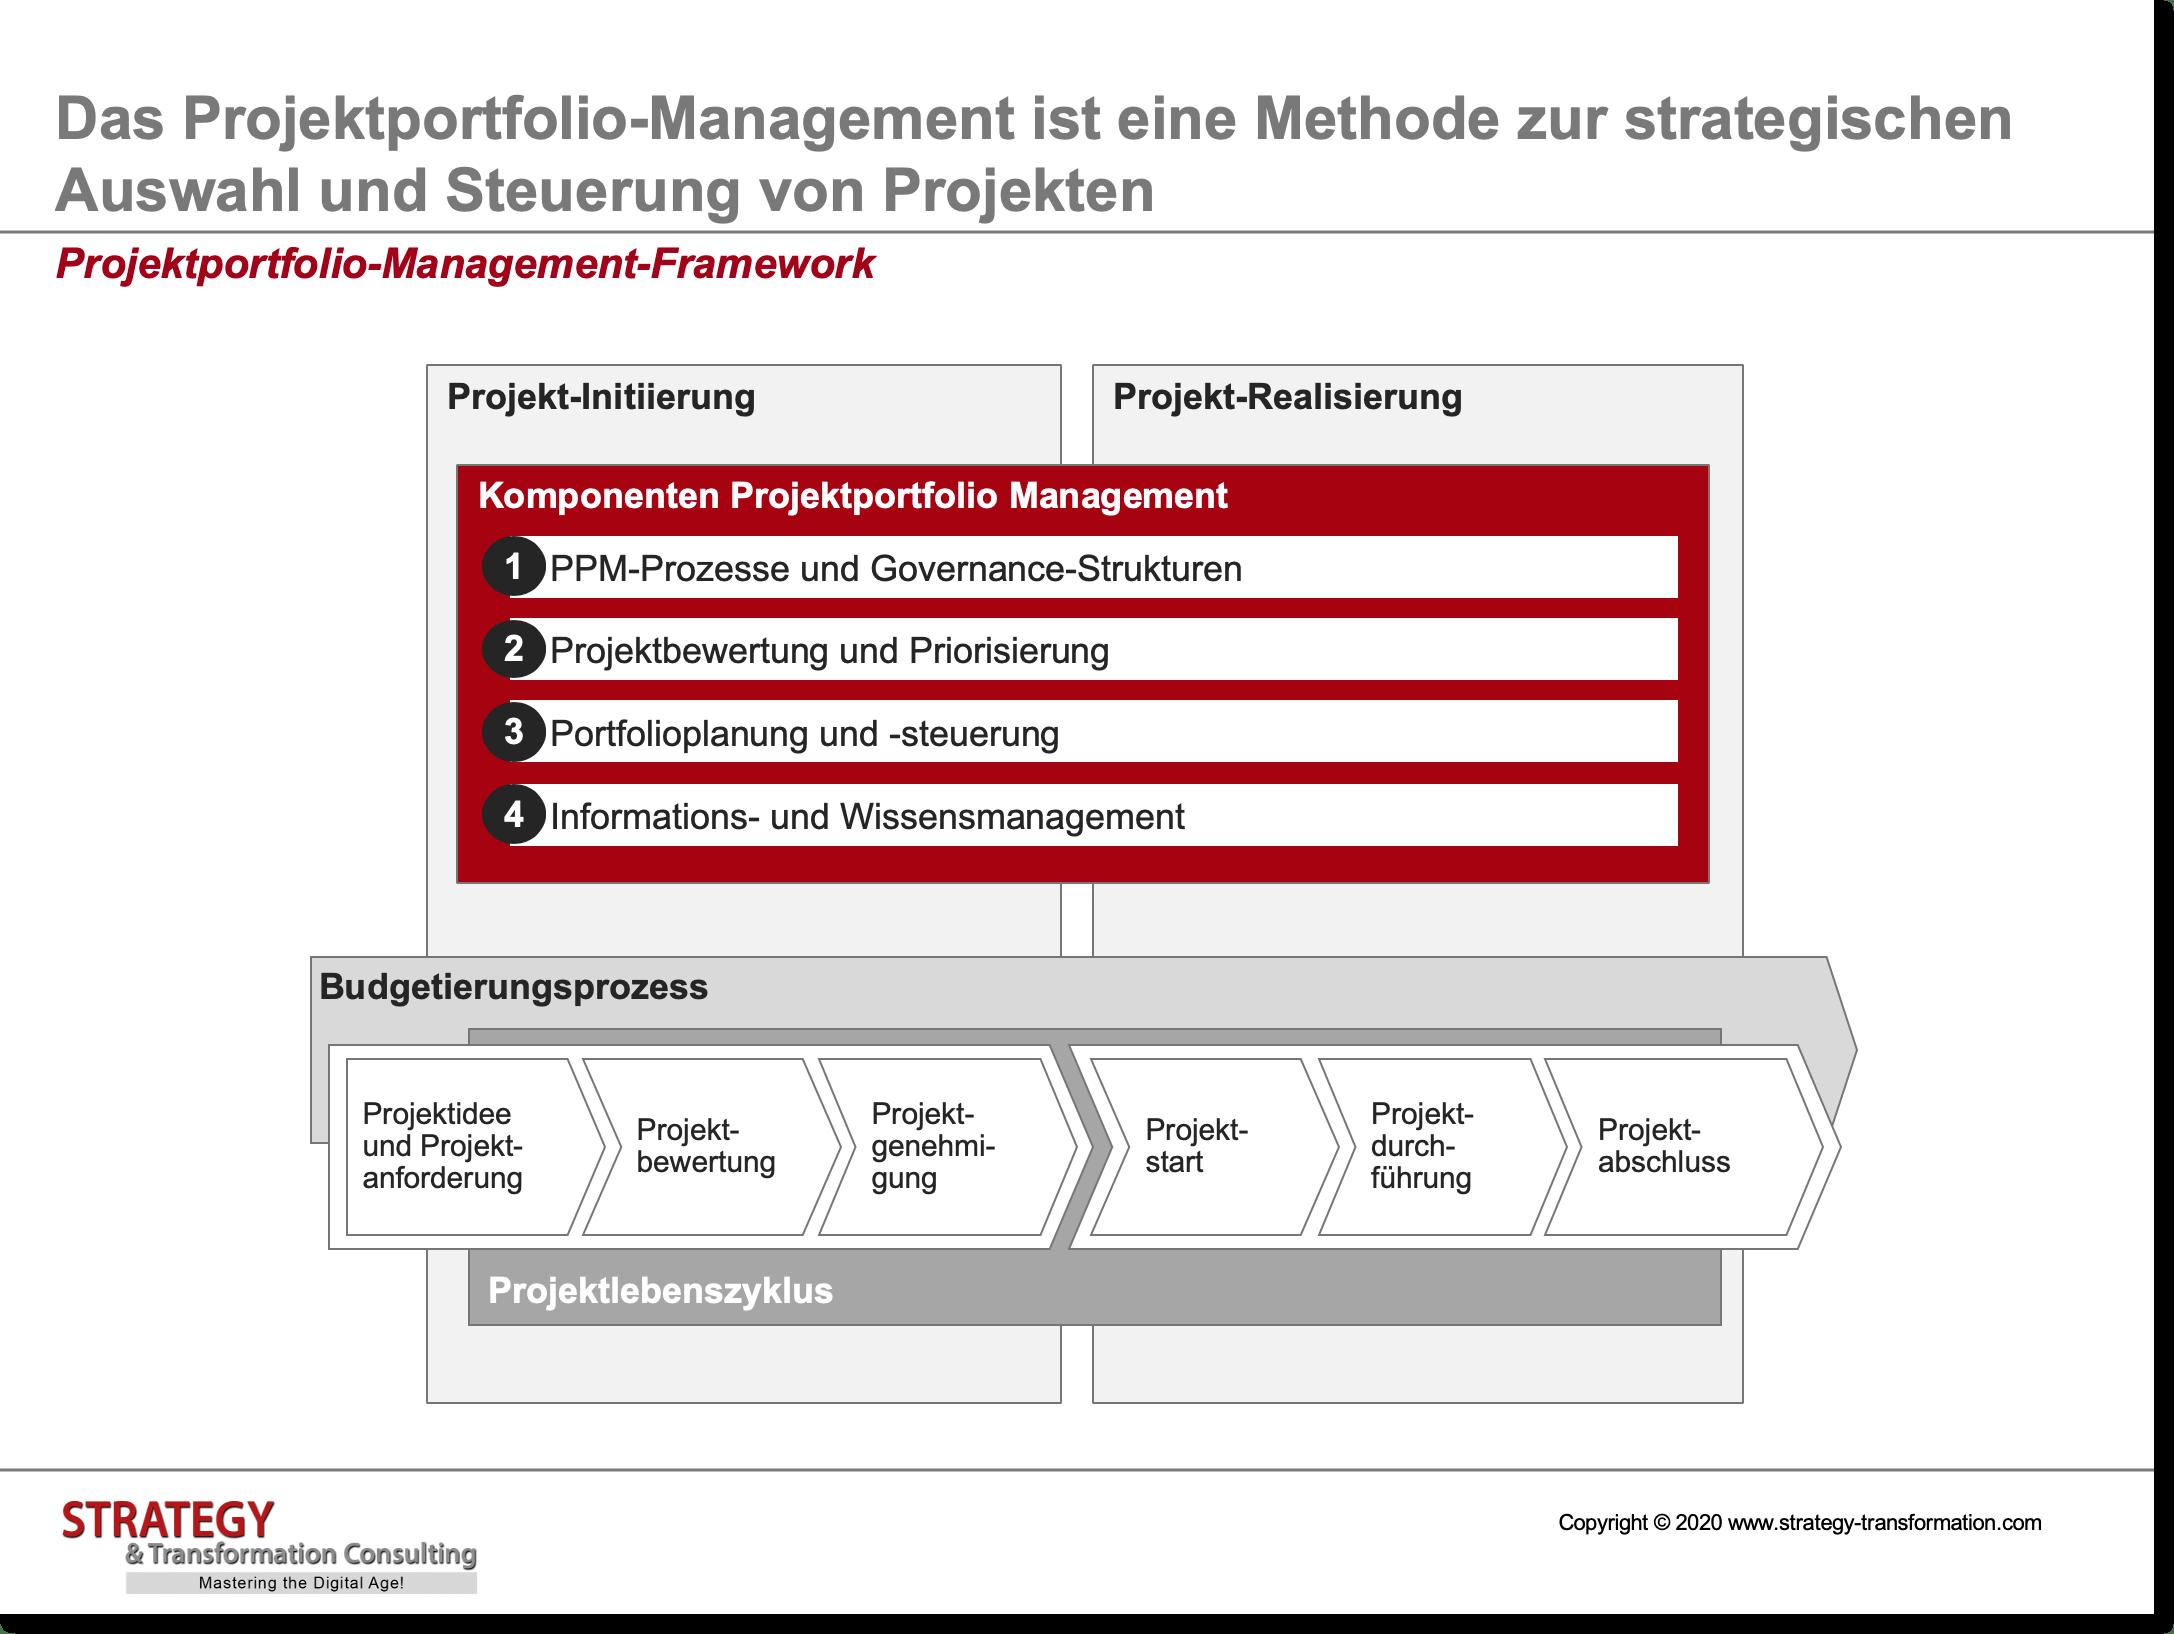 Projektportfolio-Management-Framework